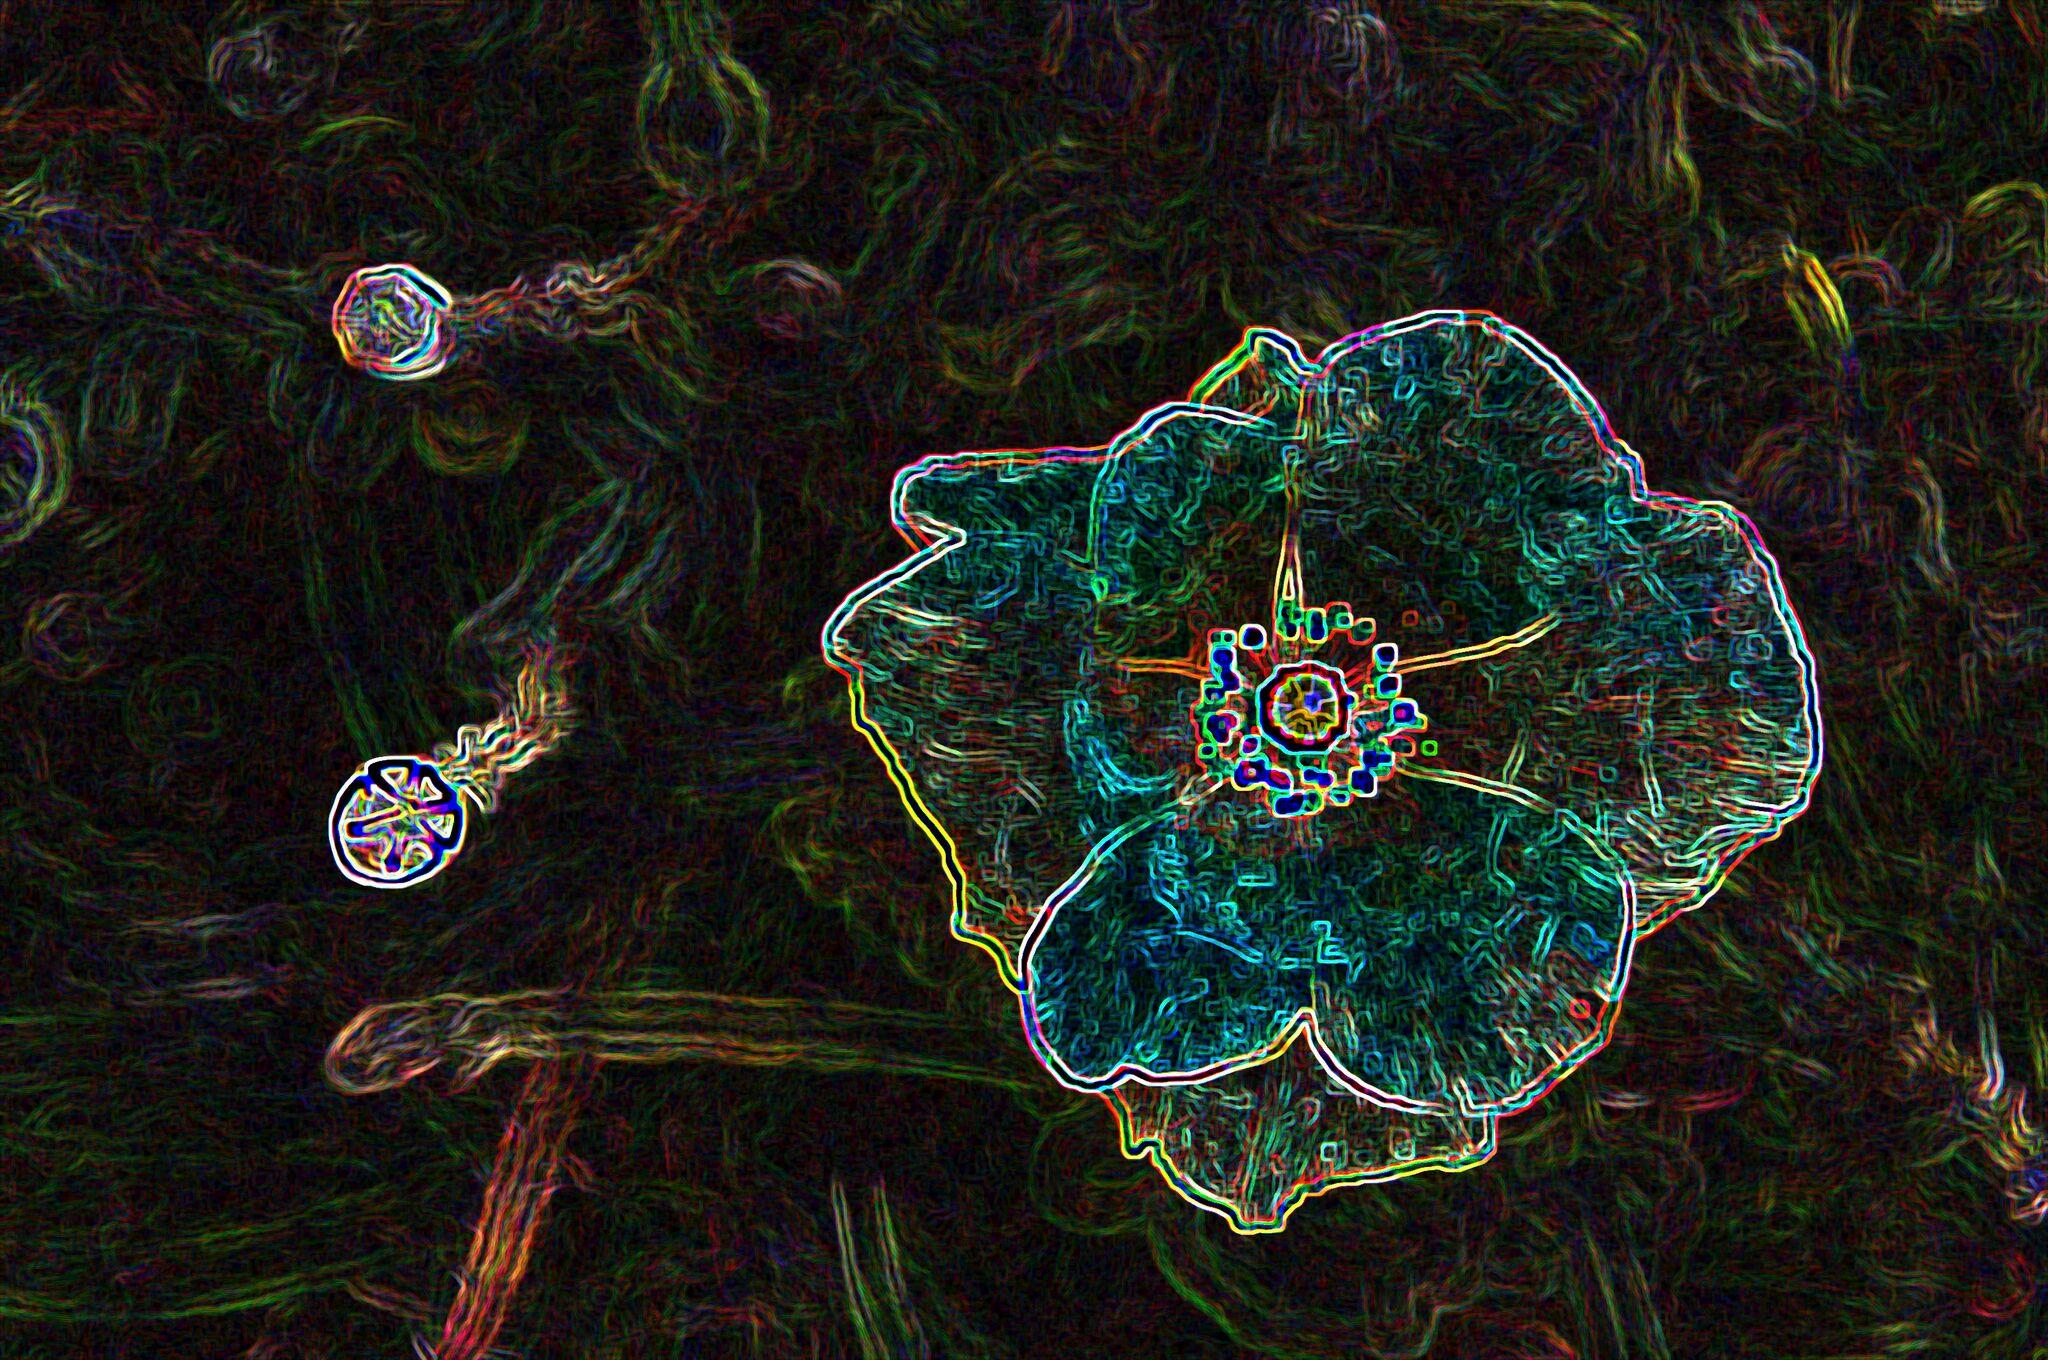 Flowery one